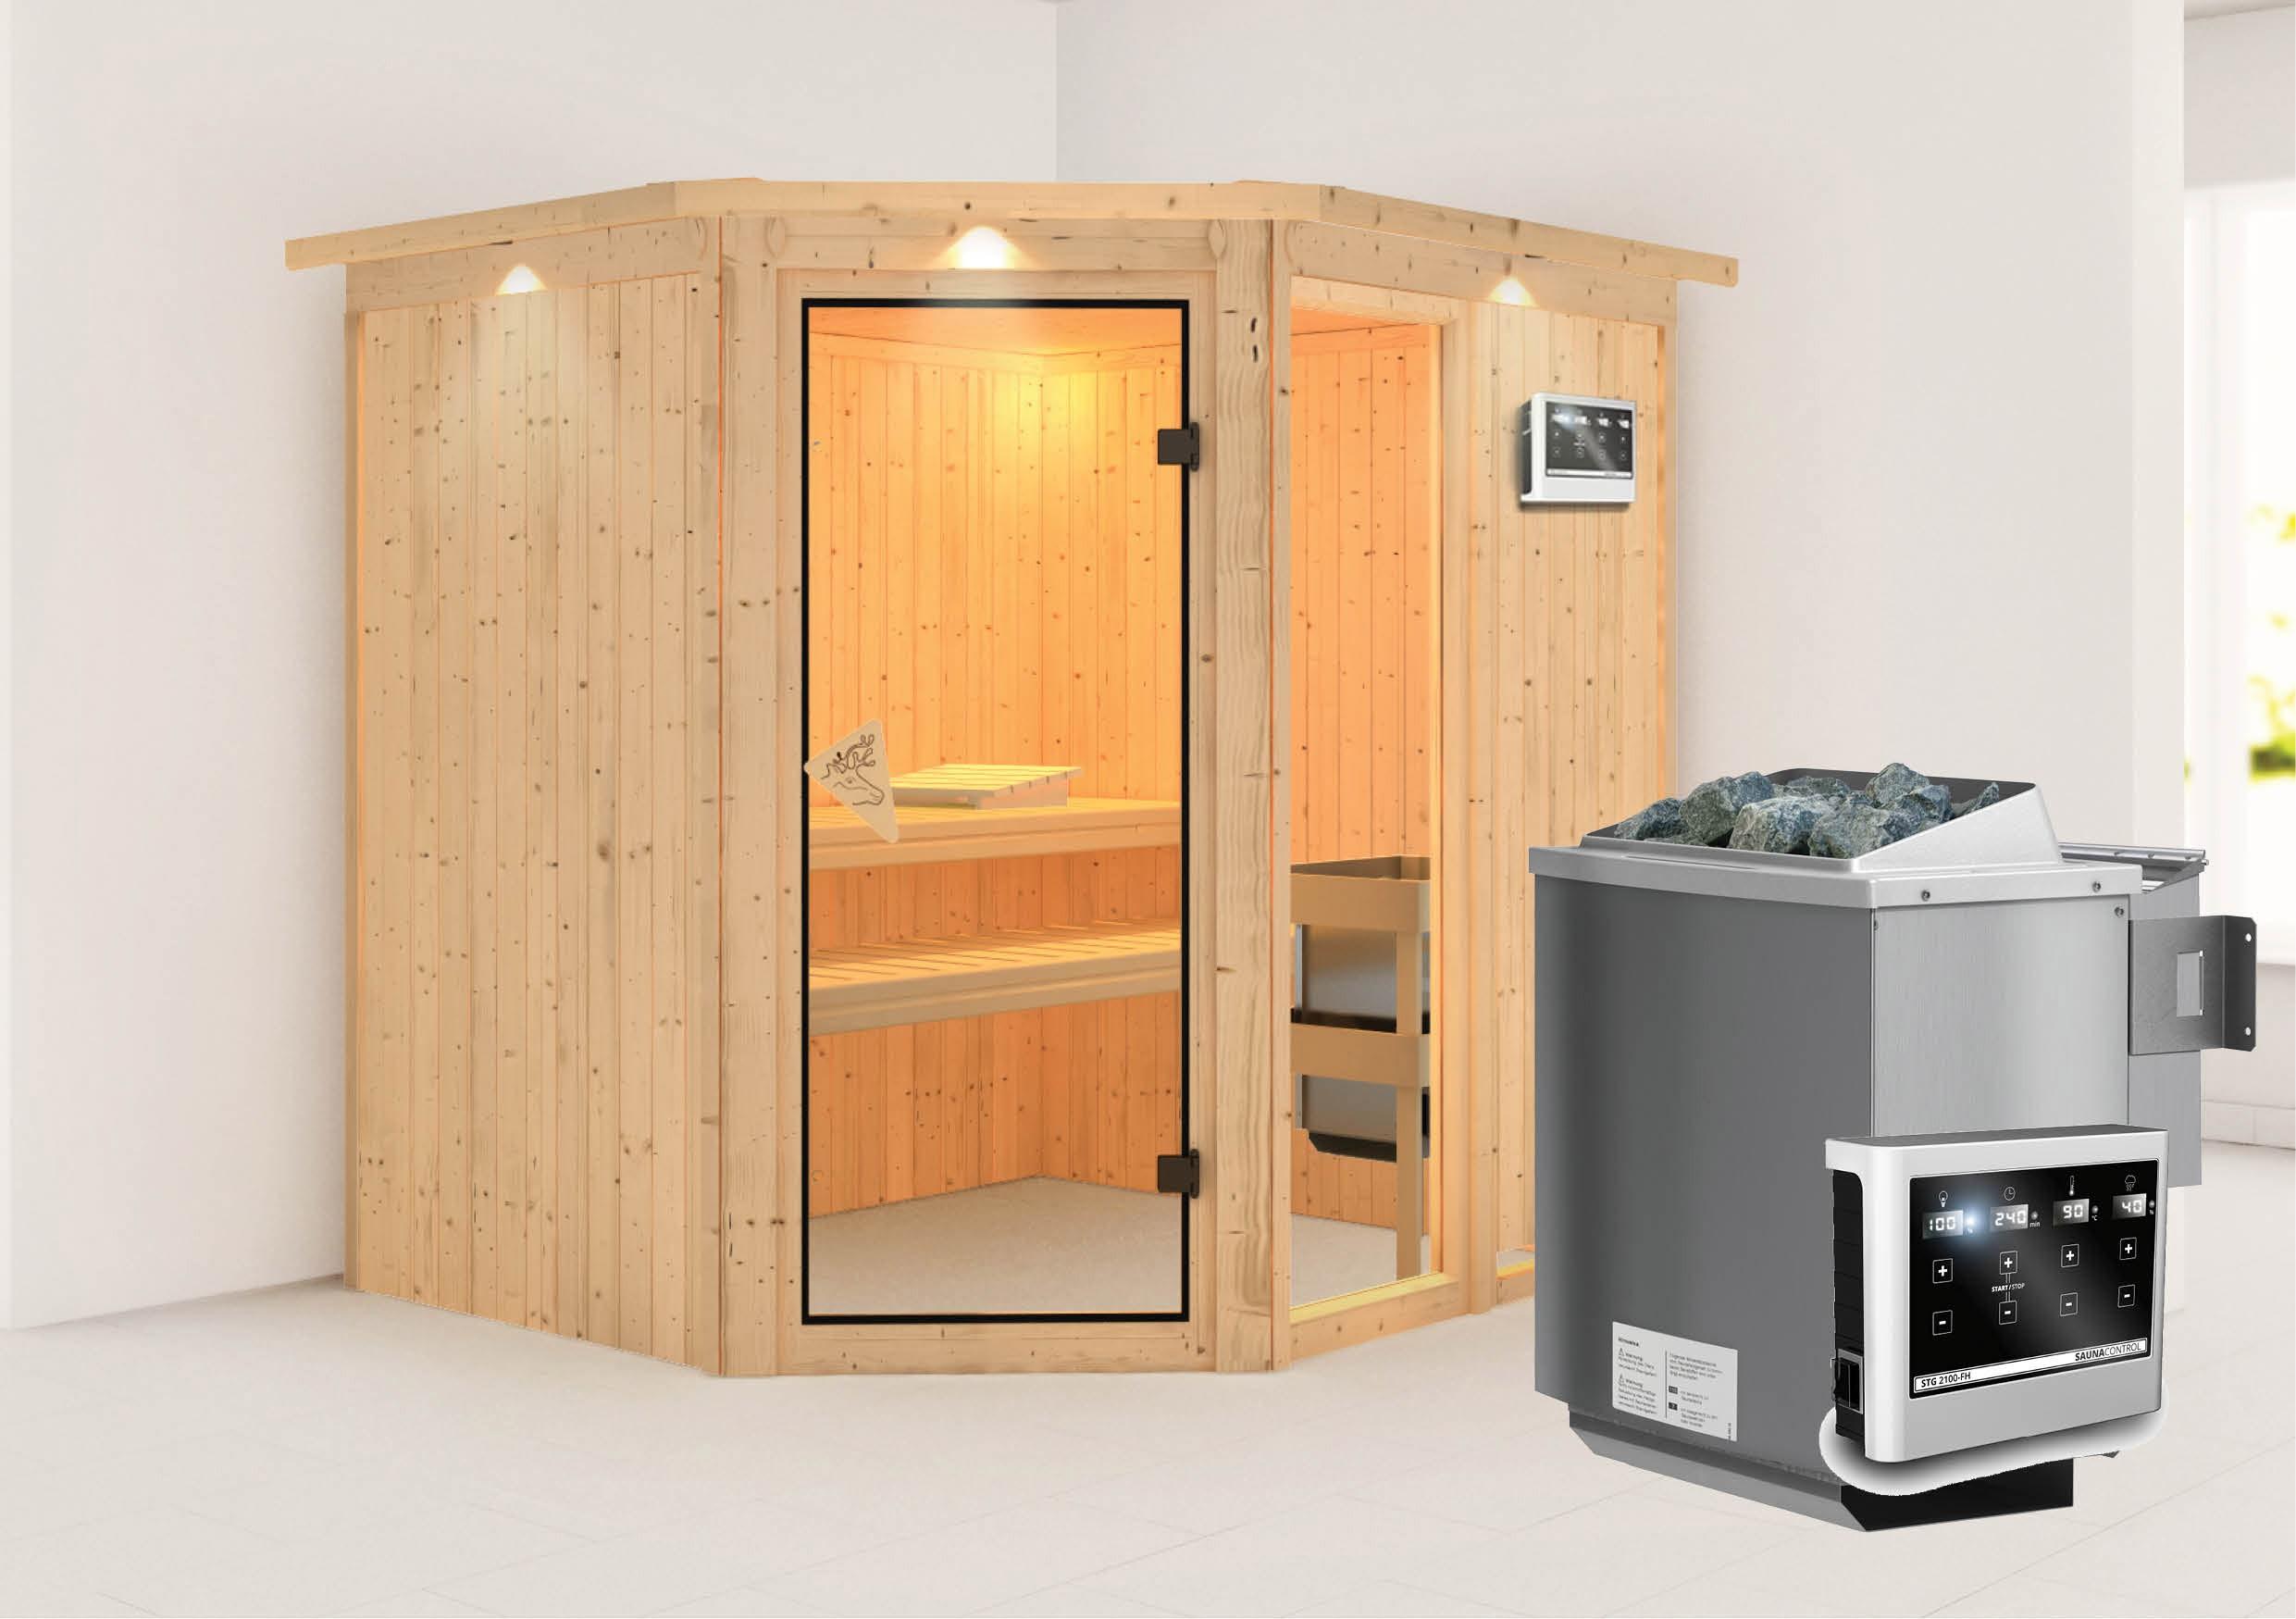 Karibu Sauna Fiona 2 68mm Dachkranz + Bio Ofen 9kW extern Bild 1